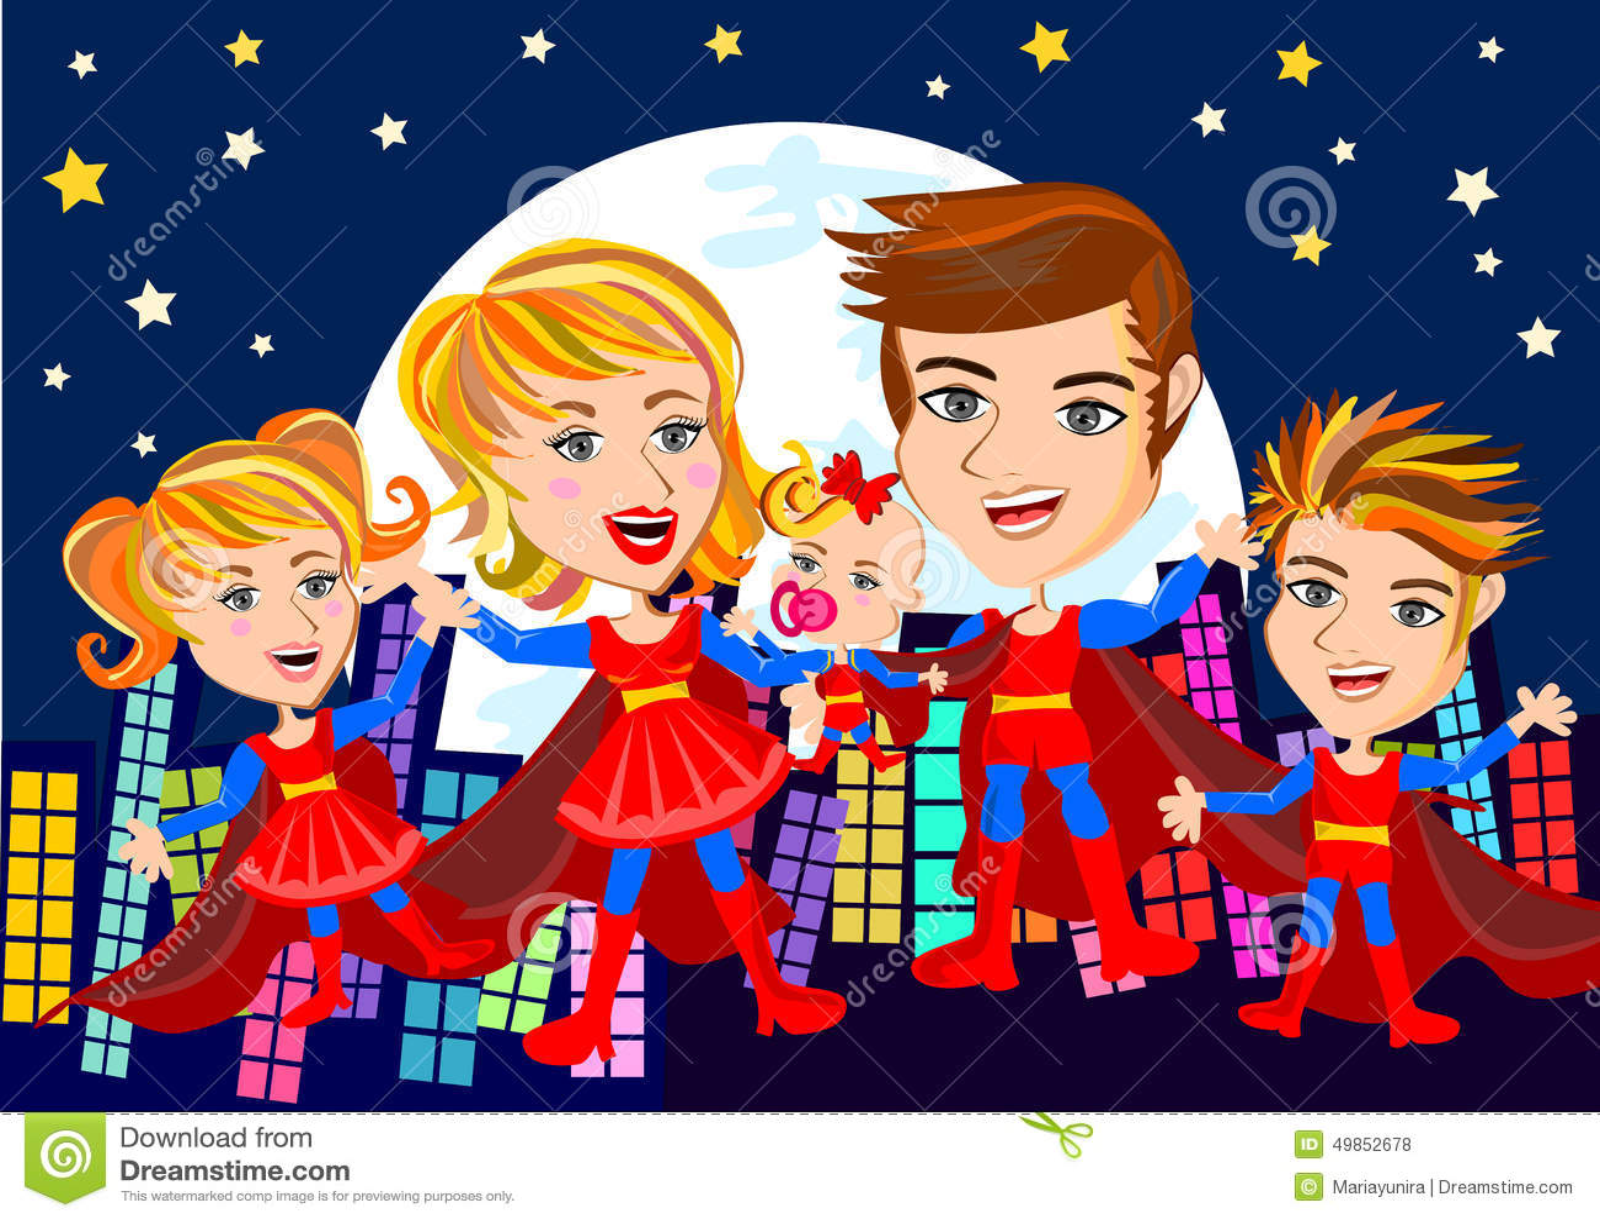 Superhero Family stock illustration. Illustration of parents - 49852678